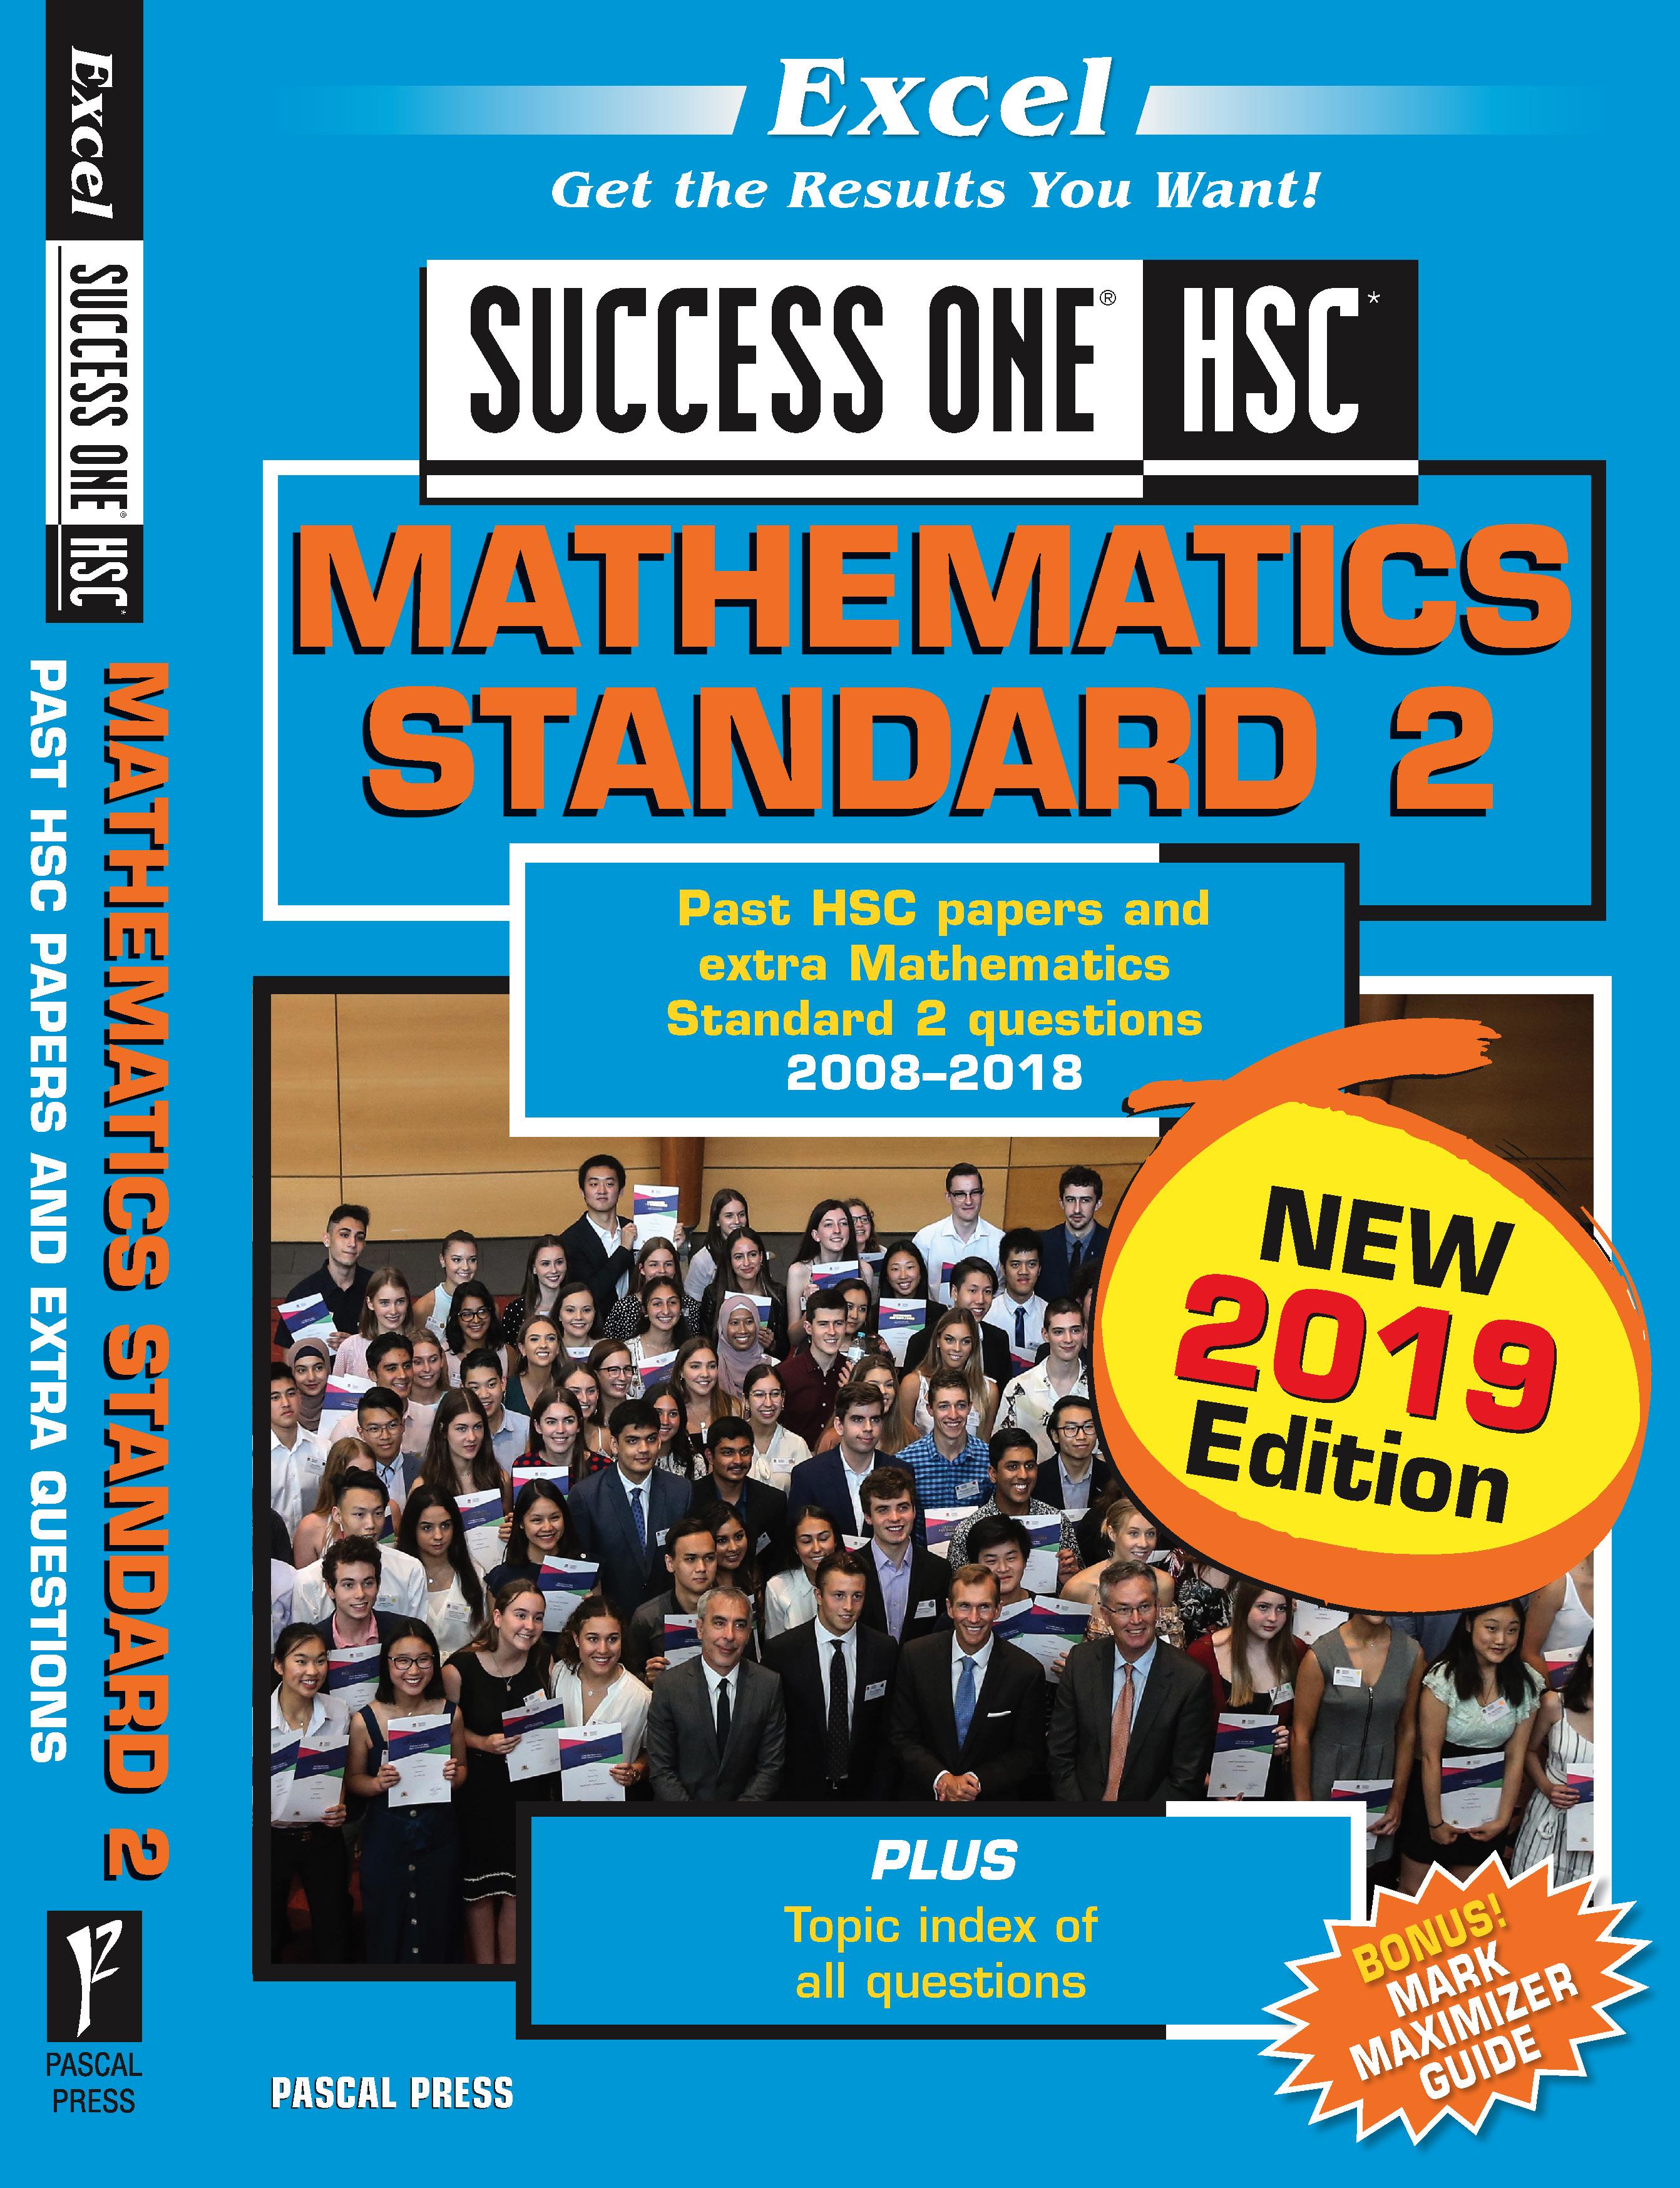 Excel Success One HSCmaths Standard 2